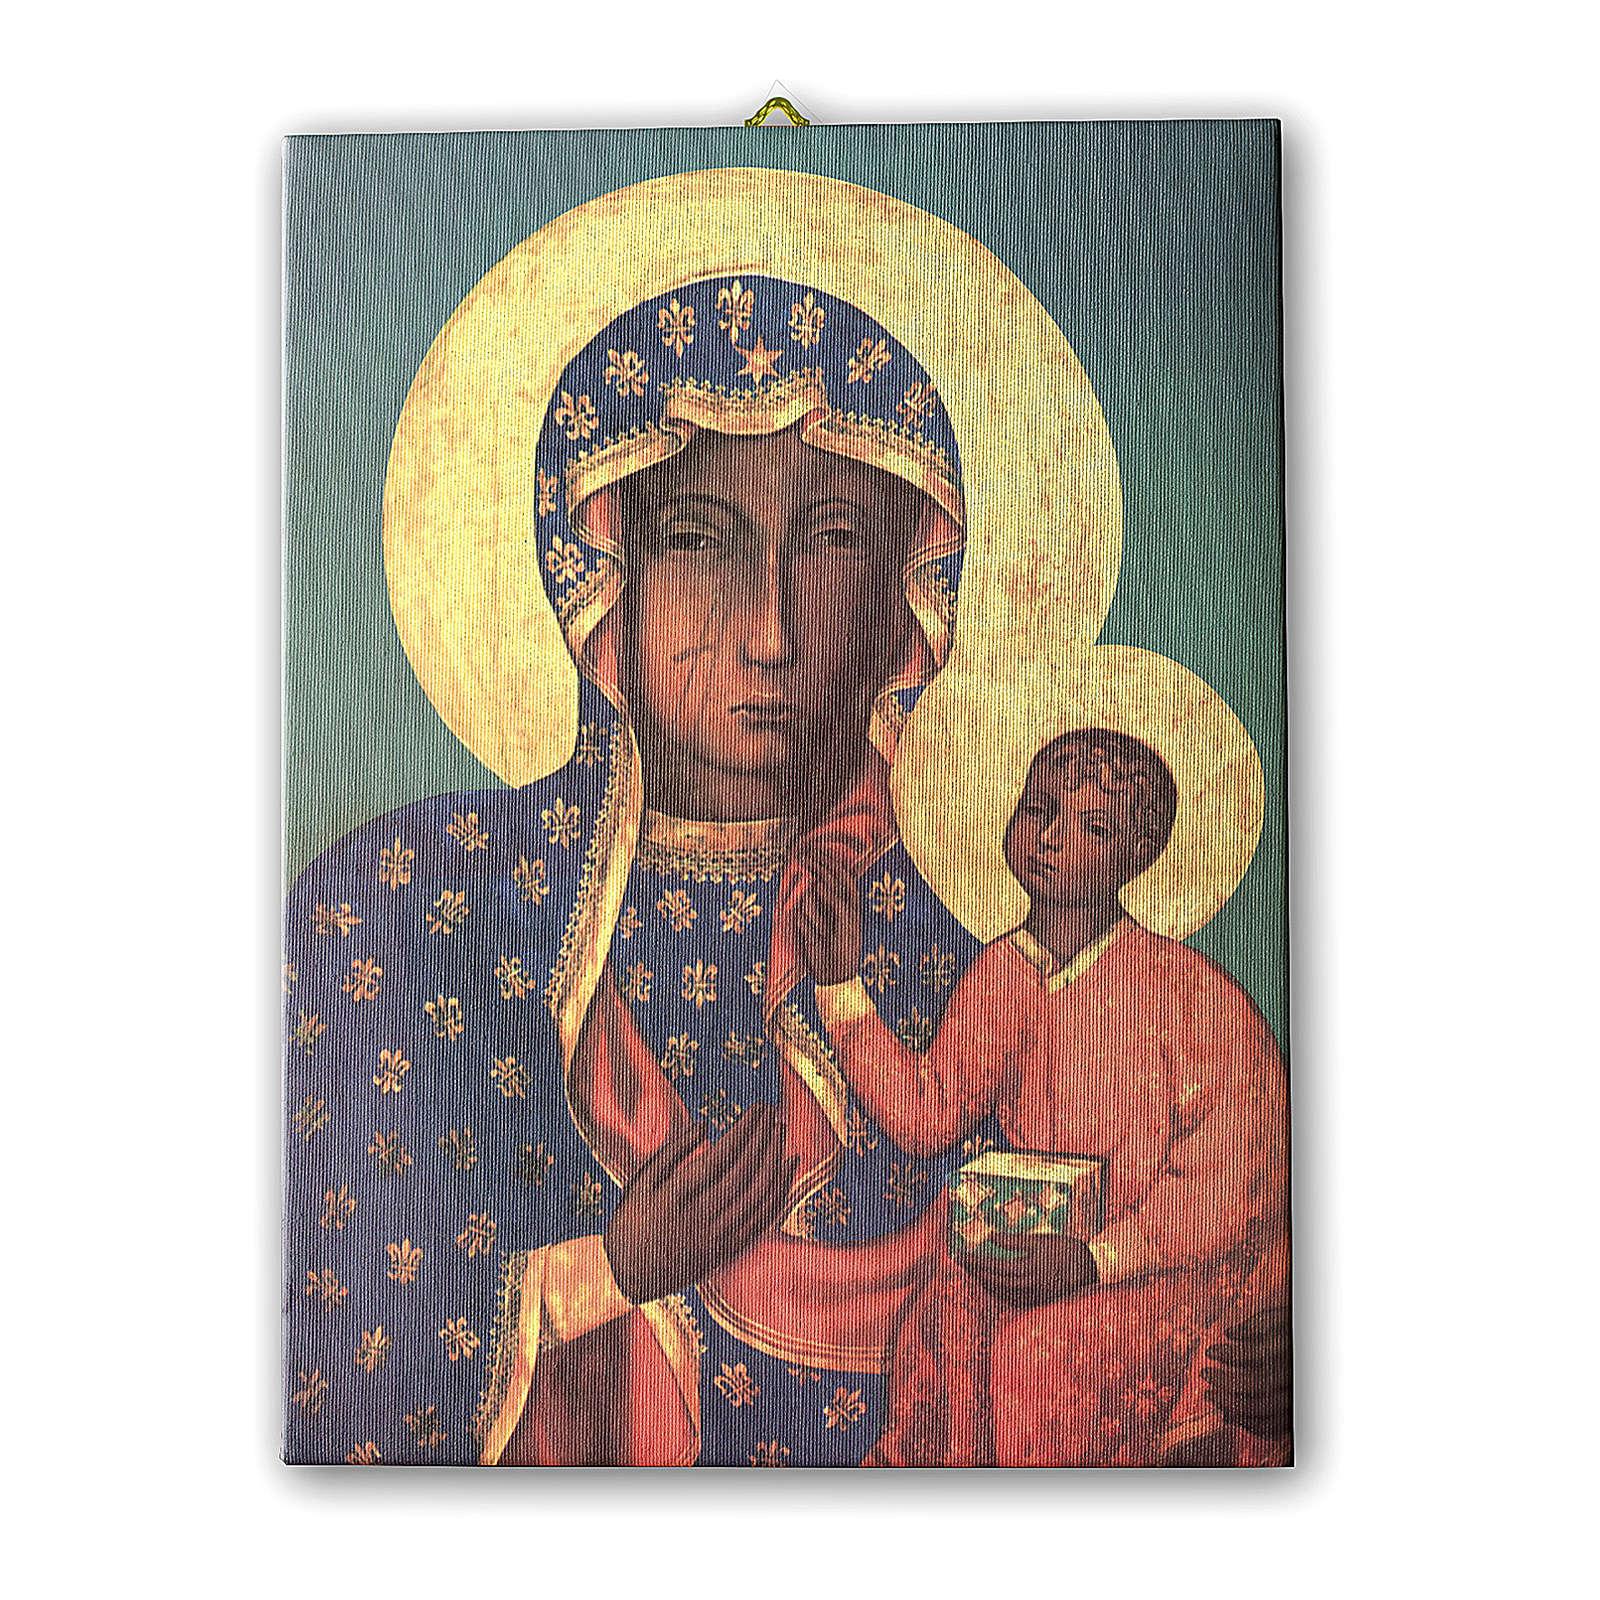 Cuadro sobre tela pictórica Virgen de Czestochowa 40x30 cm 3